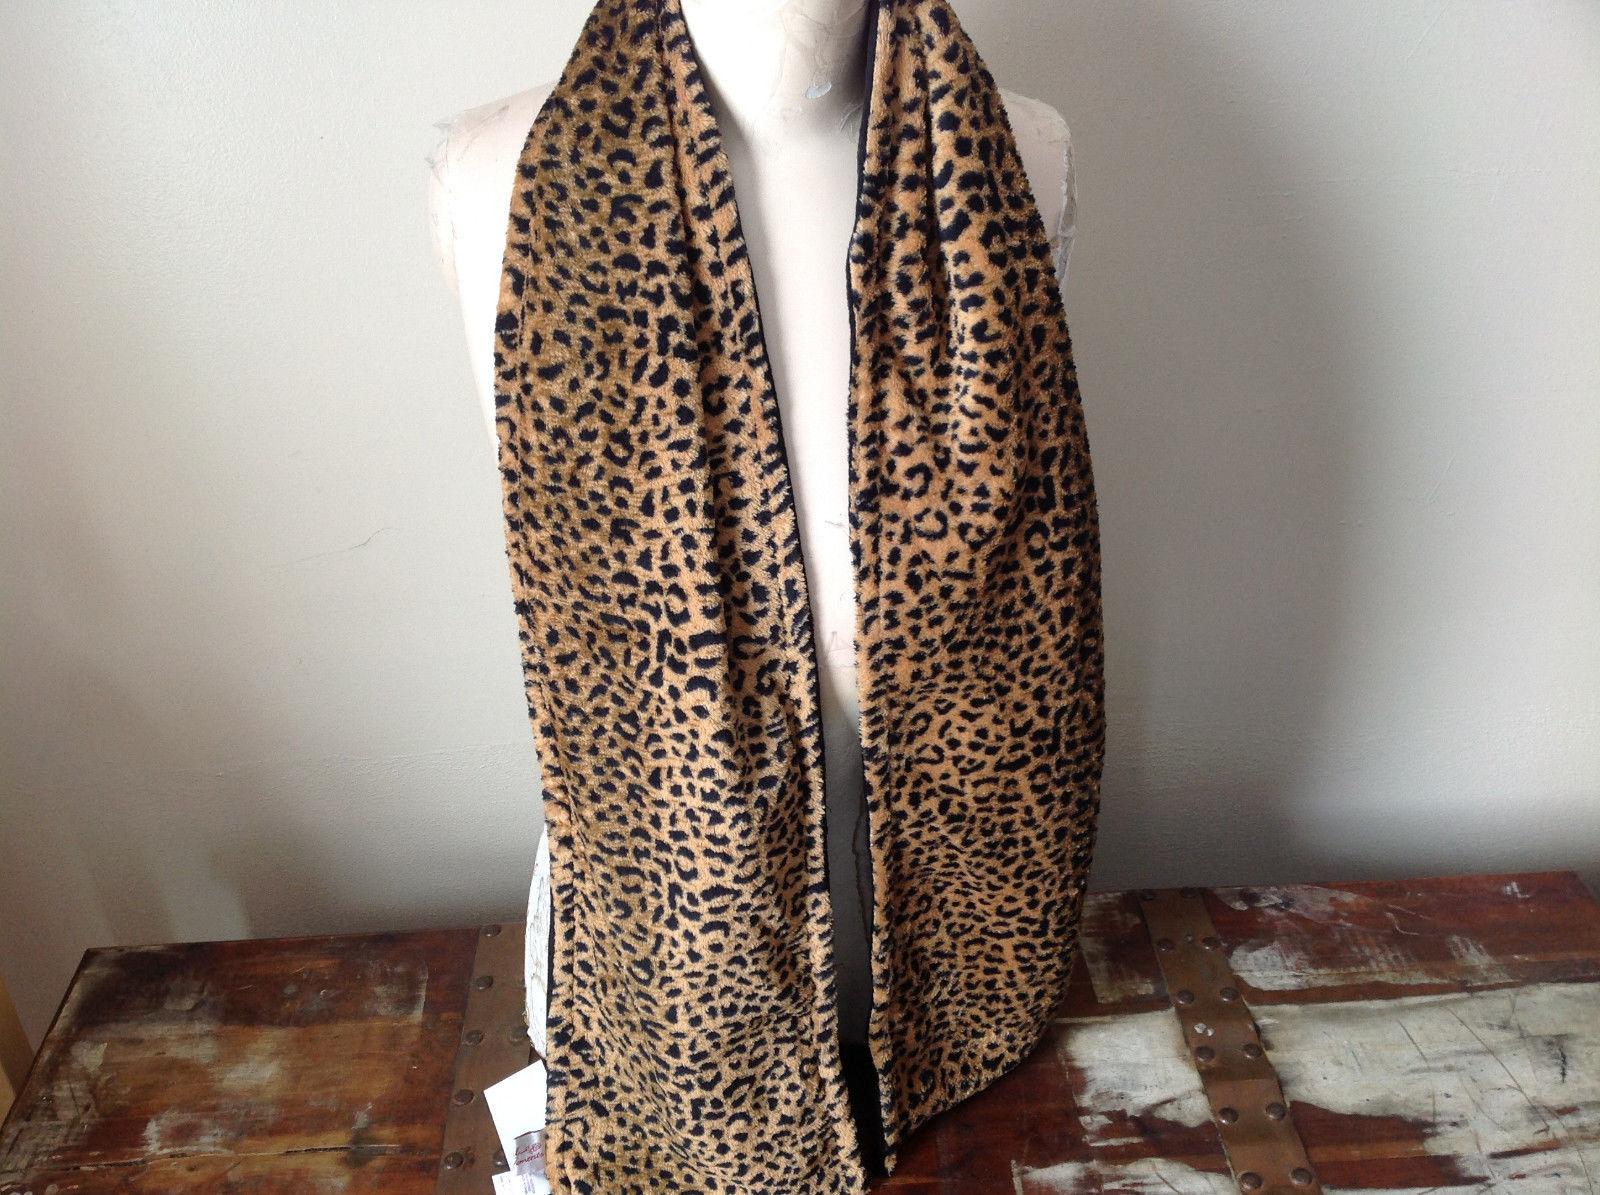 Microfiber Faux Fur Cheetah Soft Scarf See Measurements Below